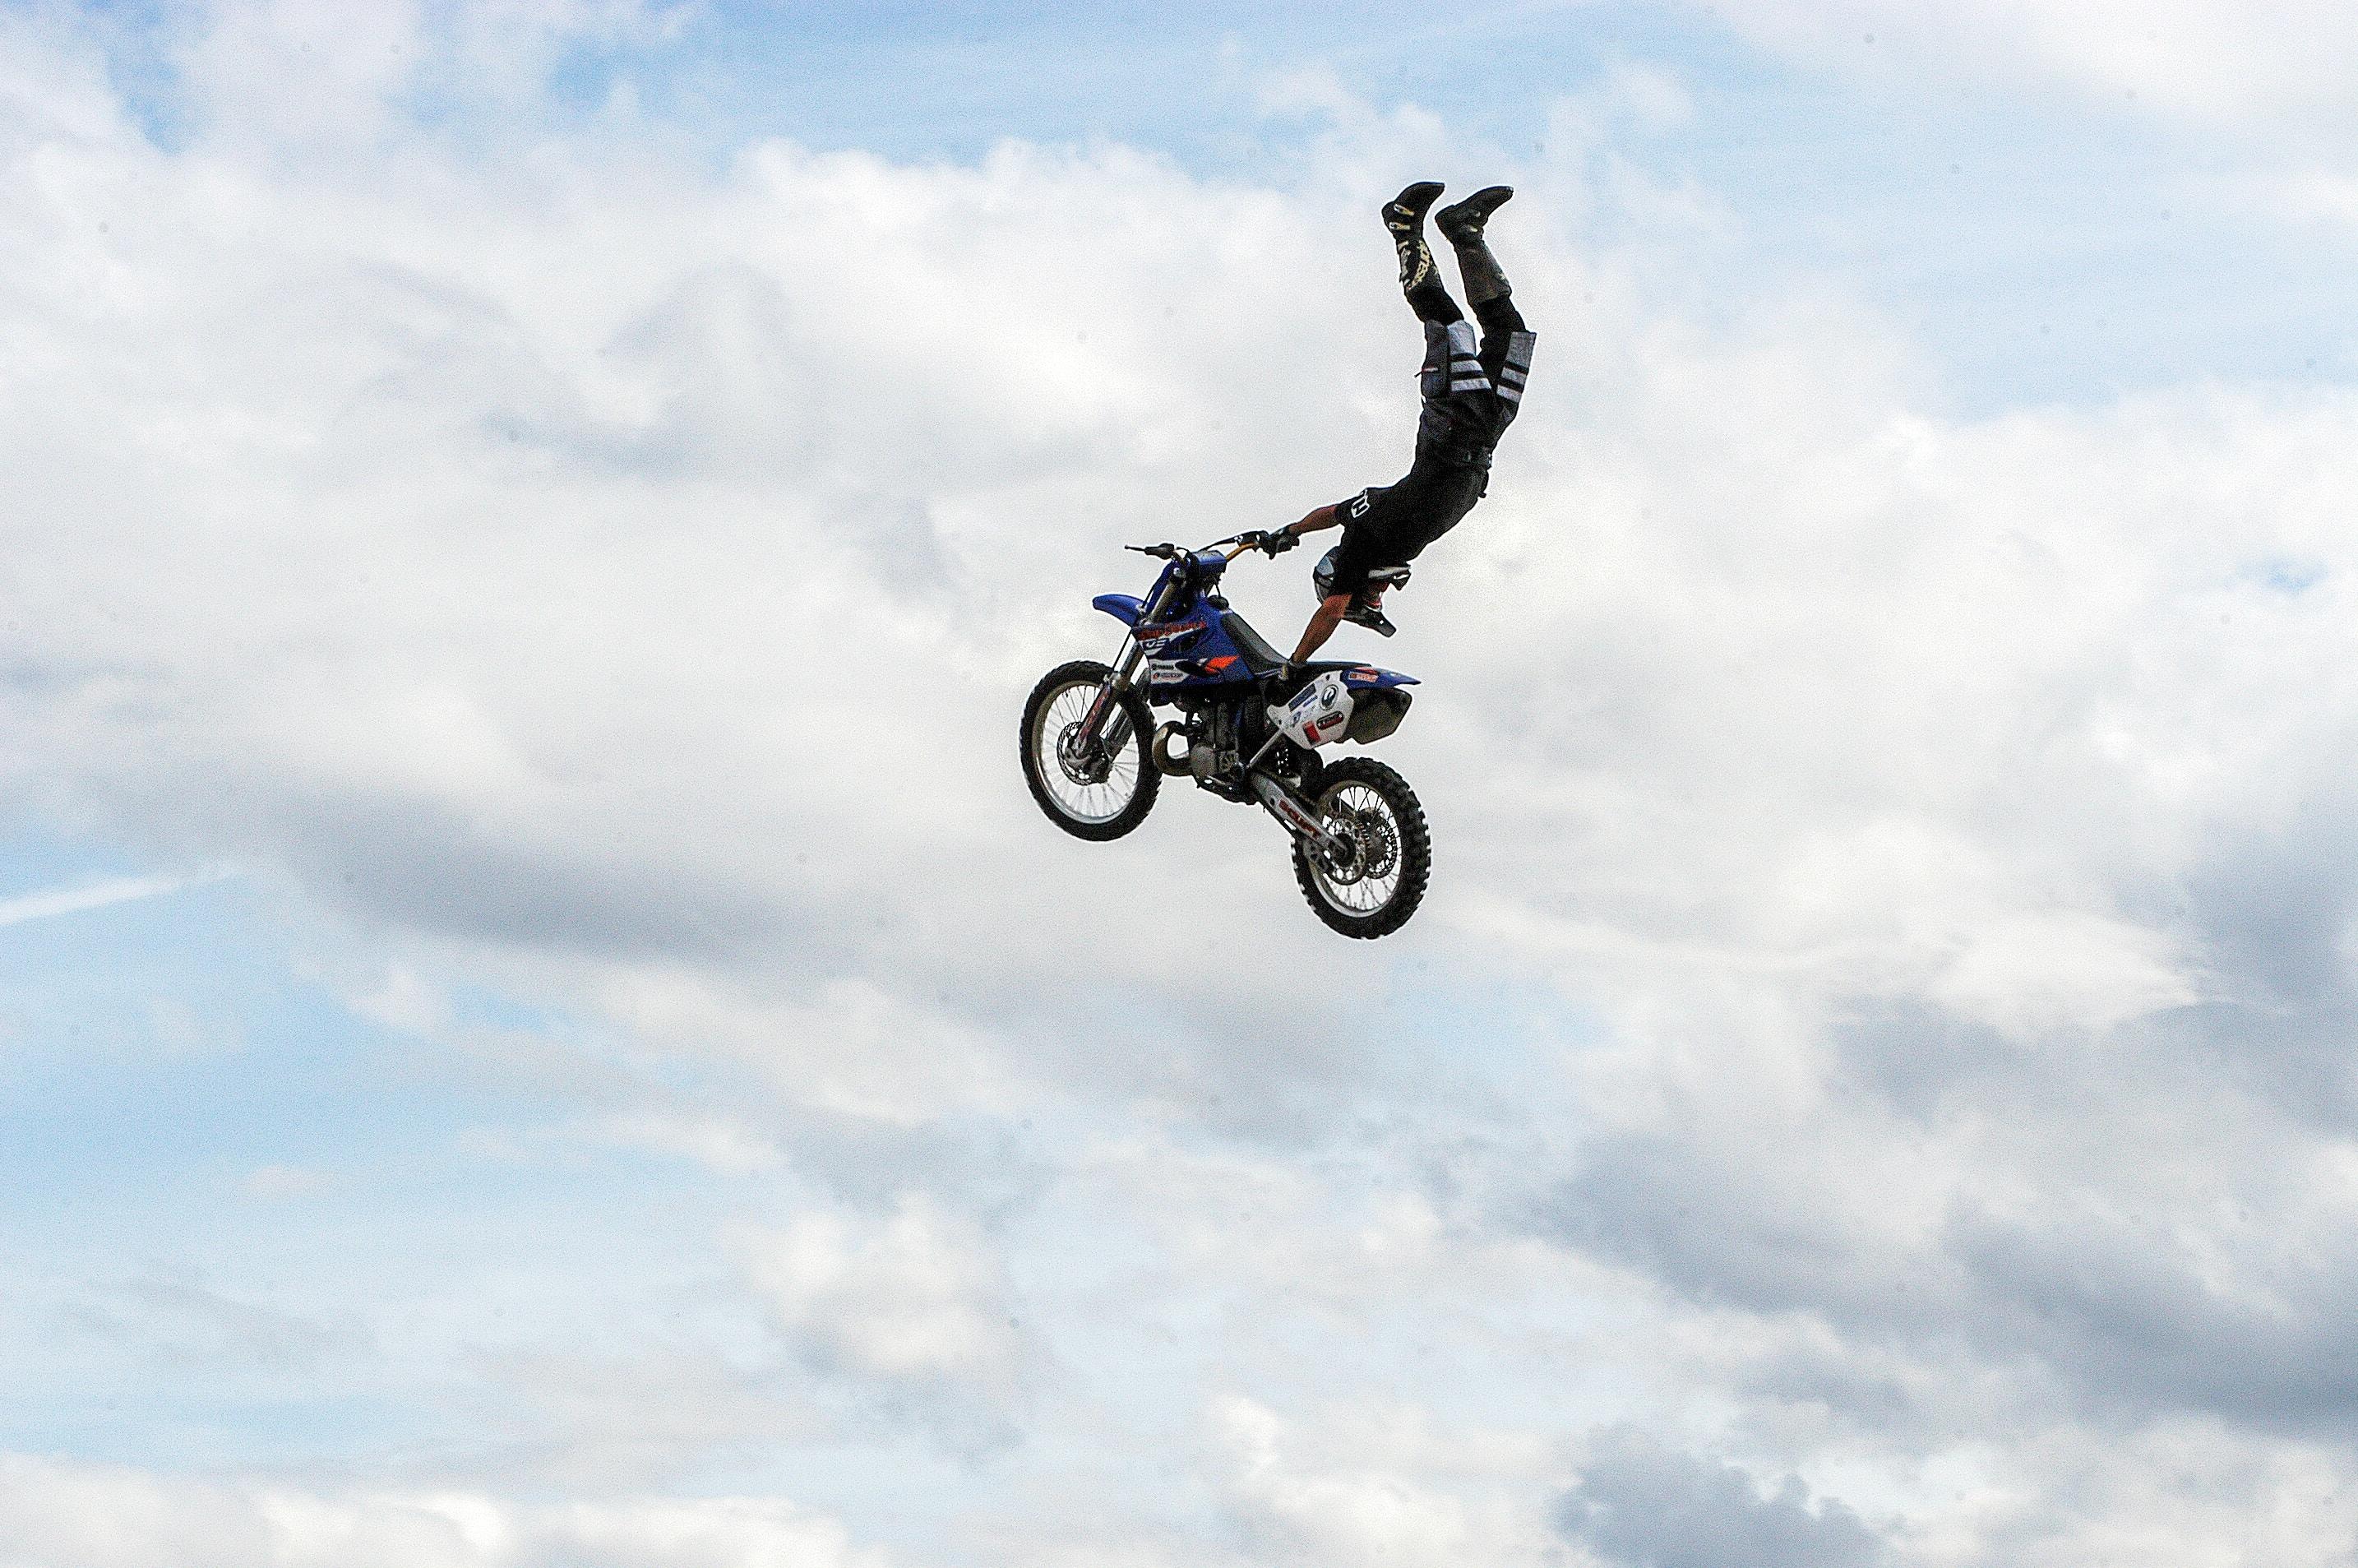 person motocross exhibition